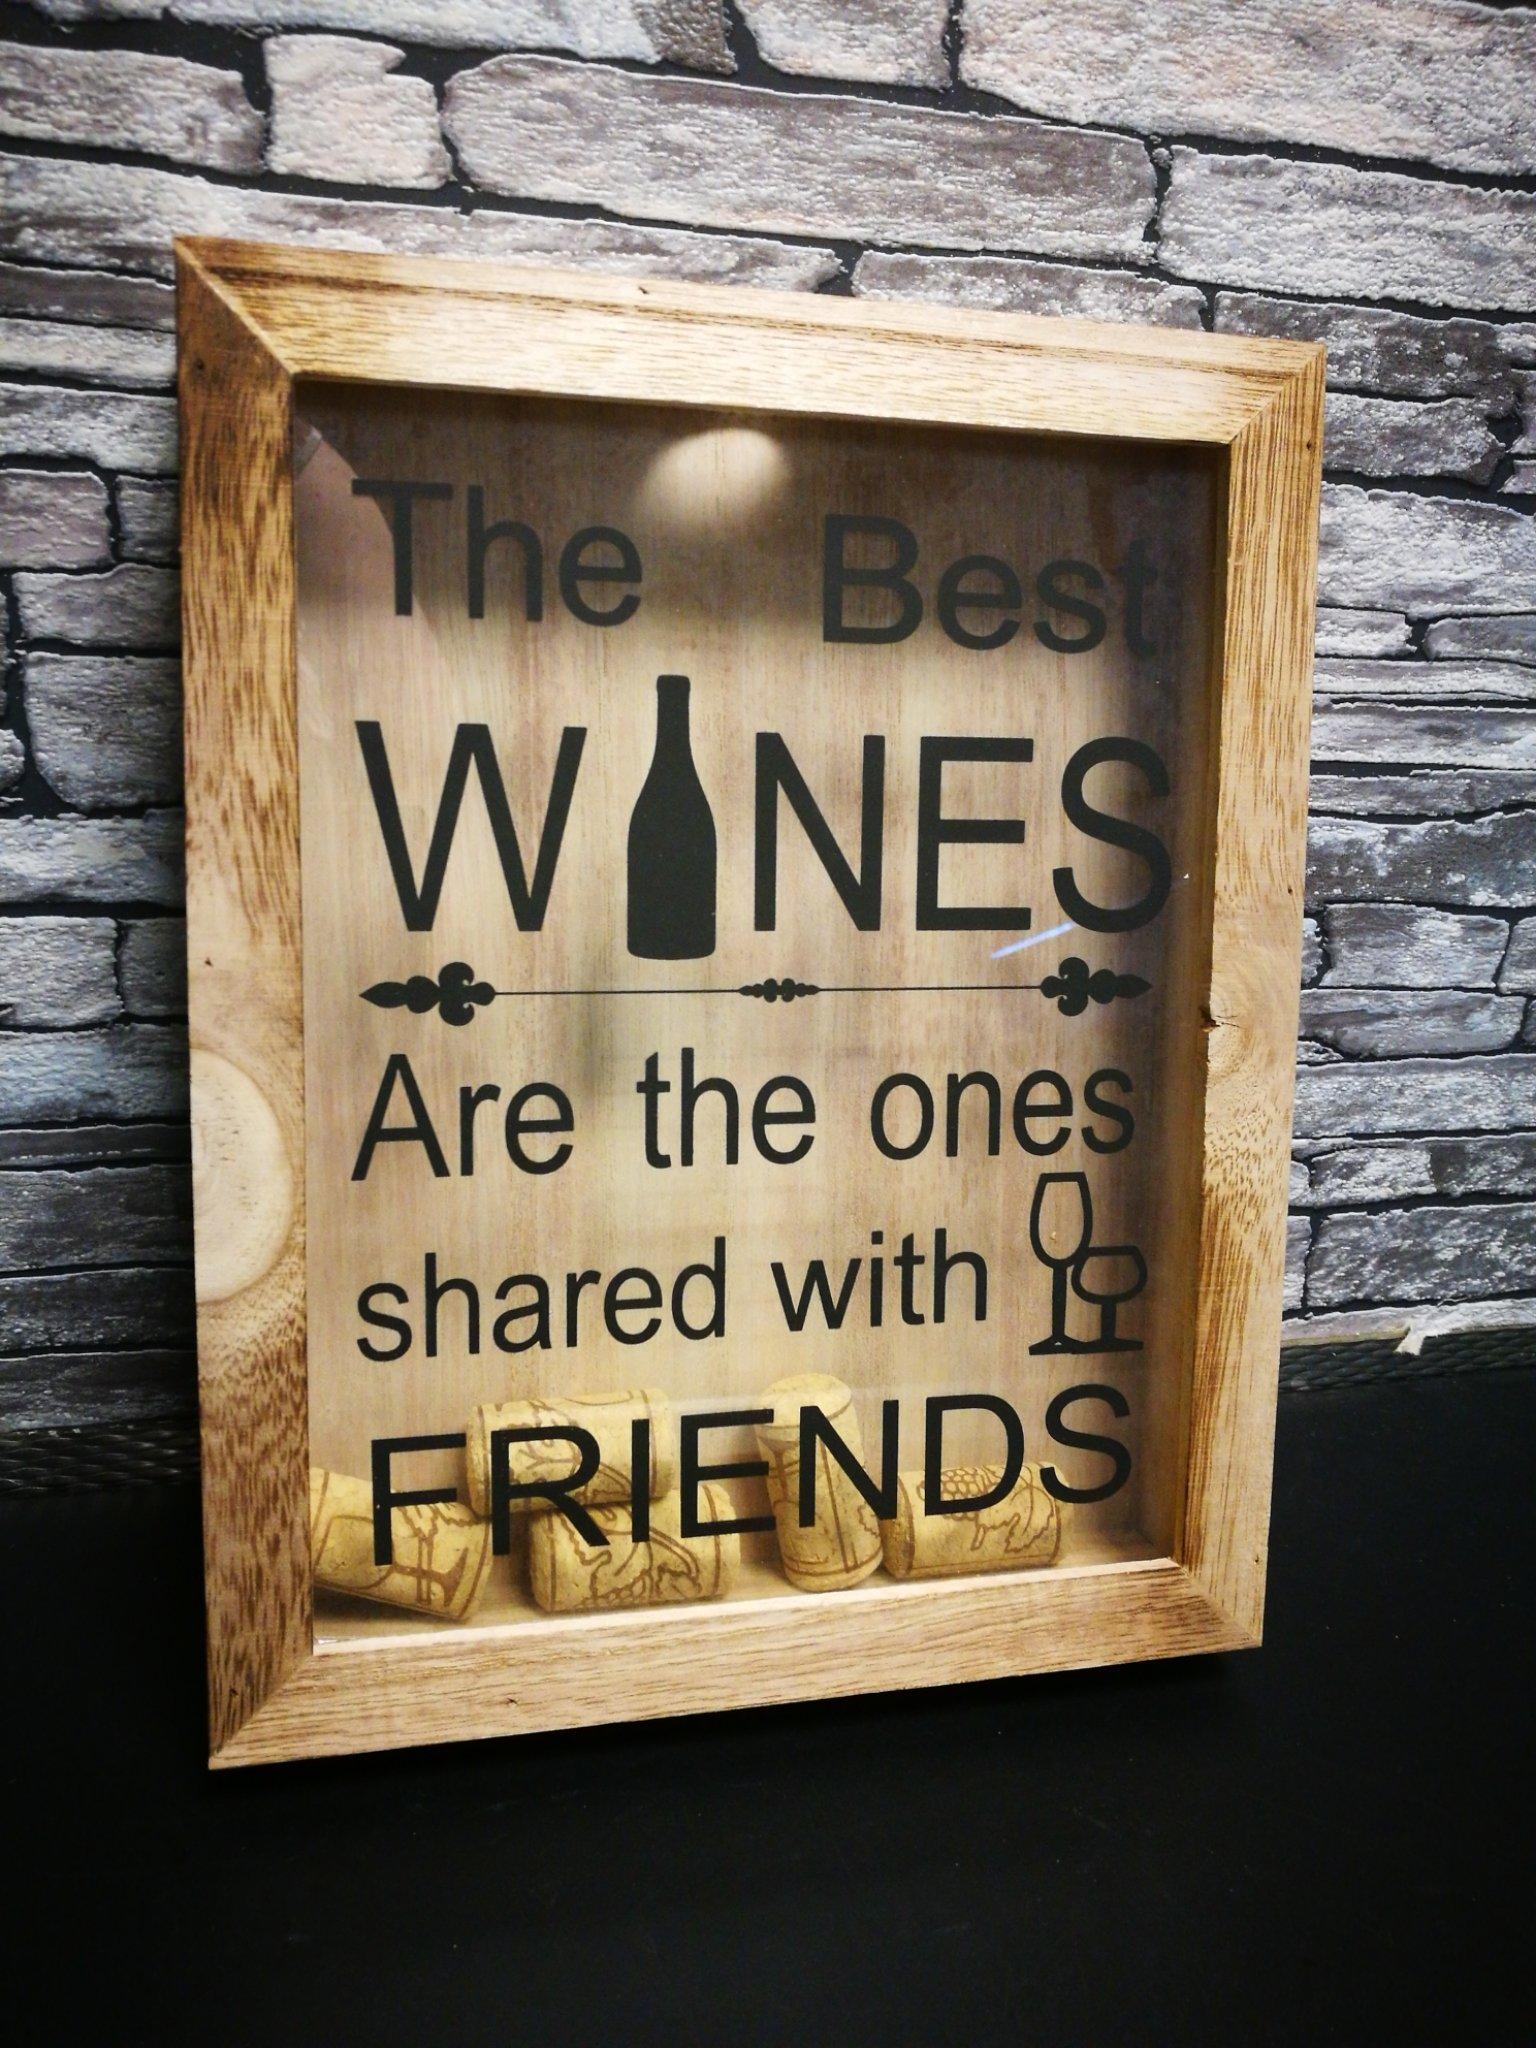 Wijnkurken kastje Friends 01125